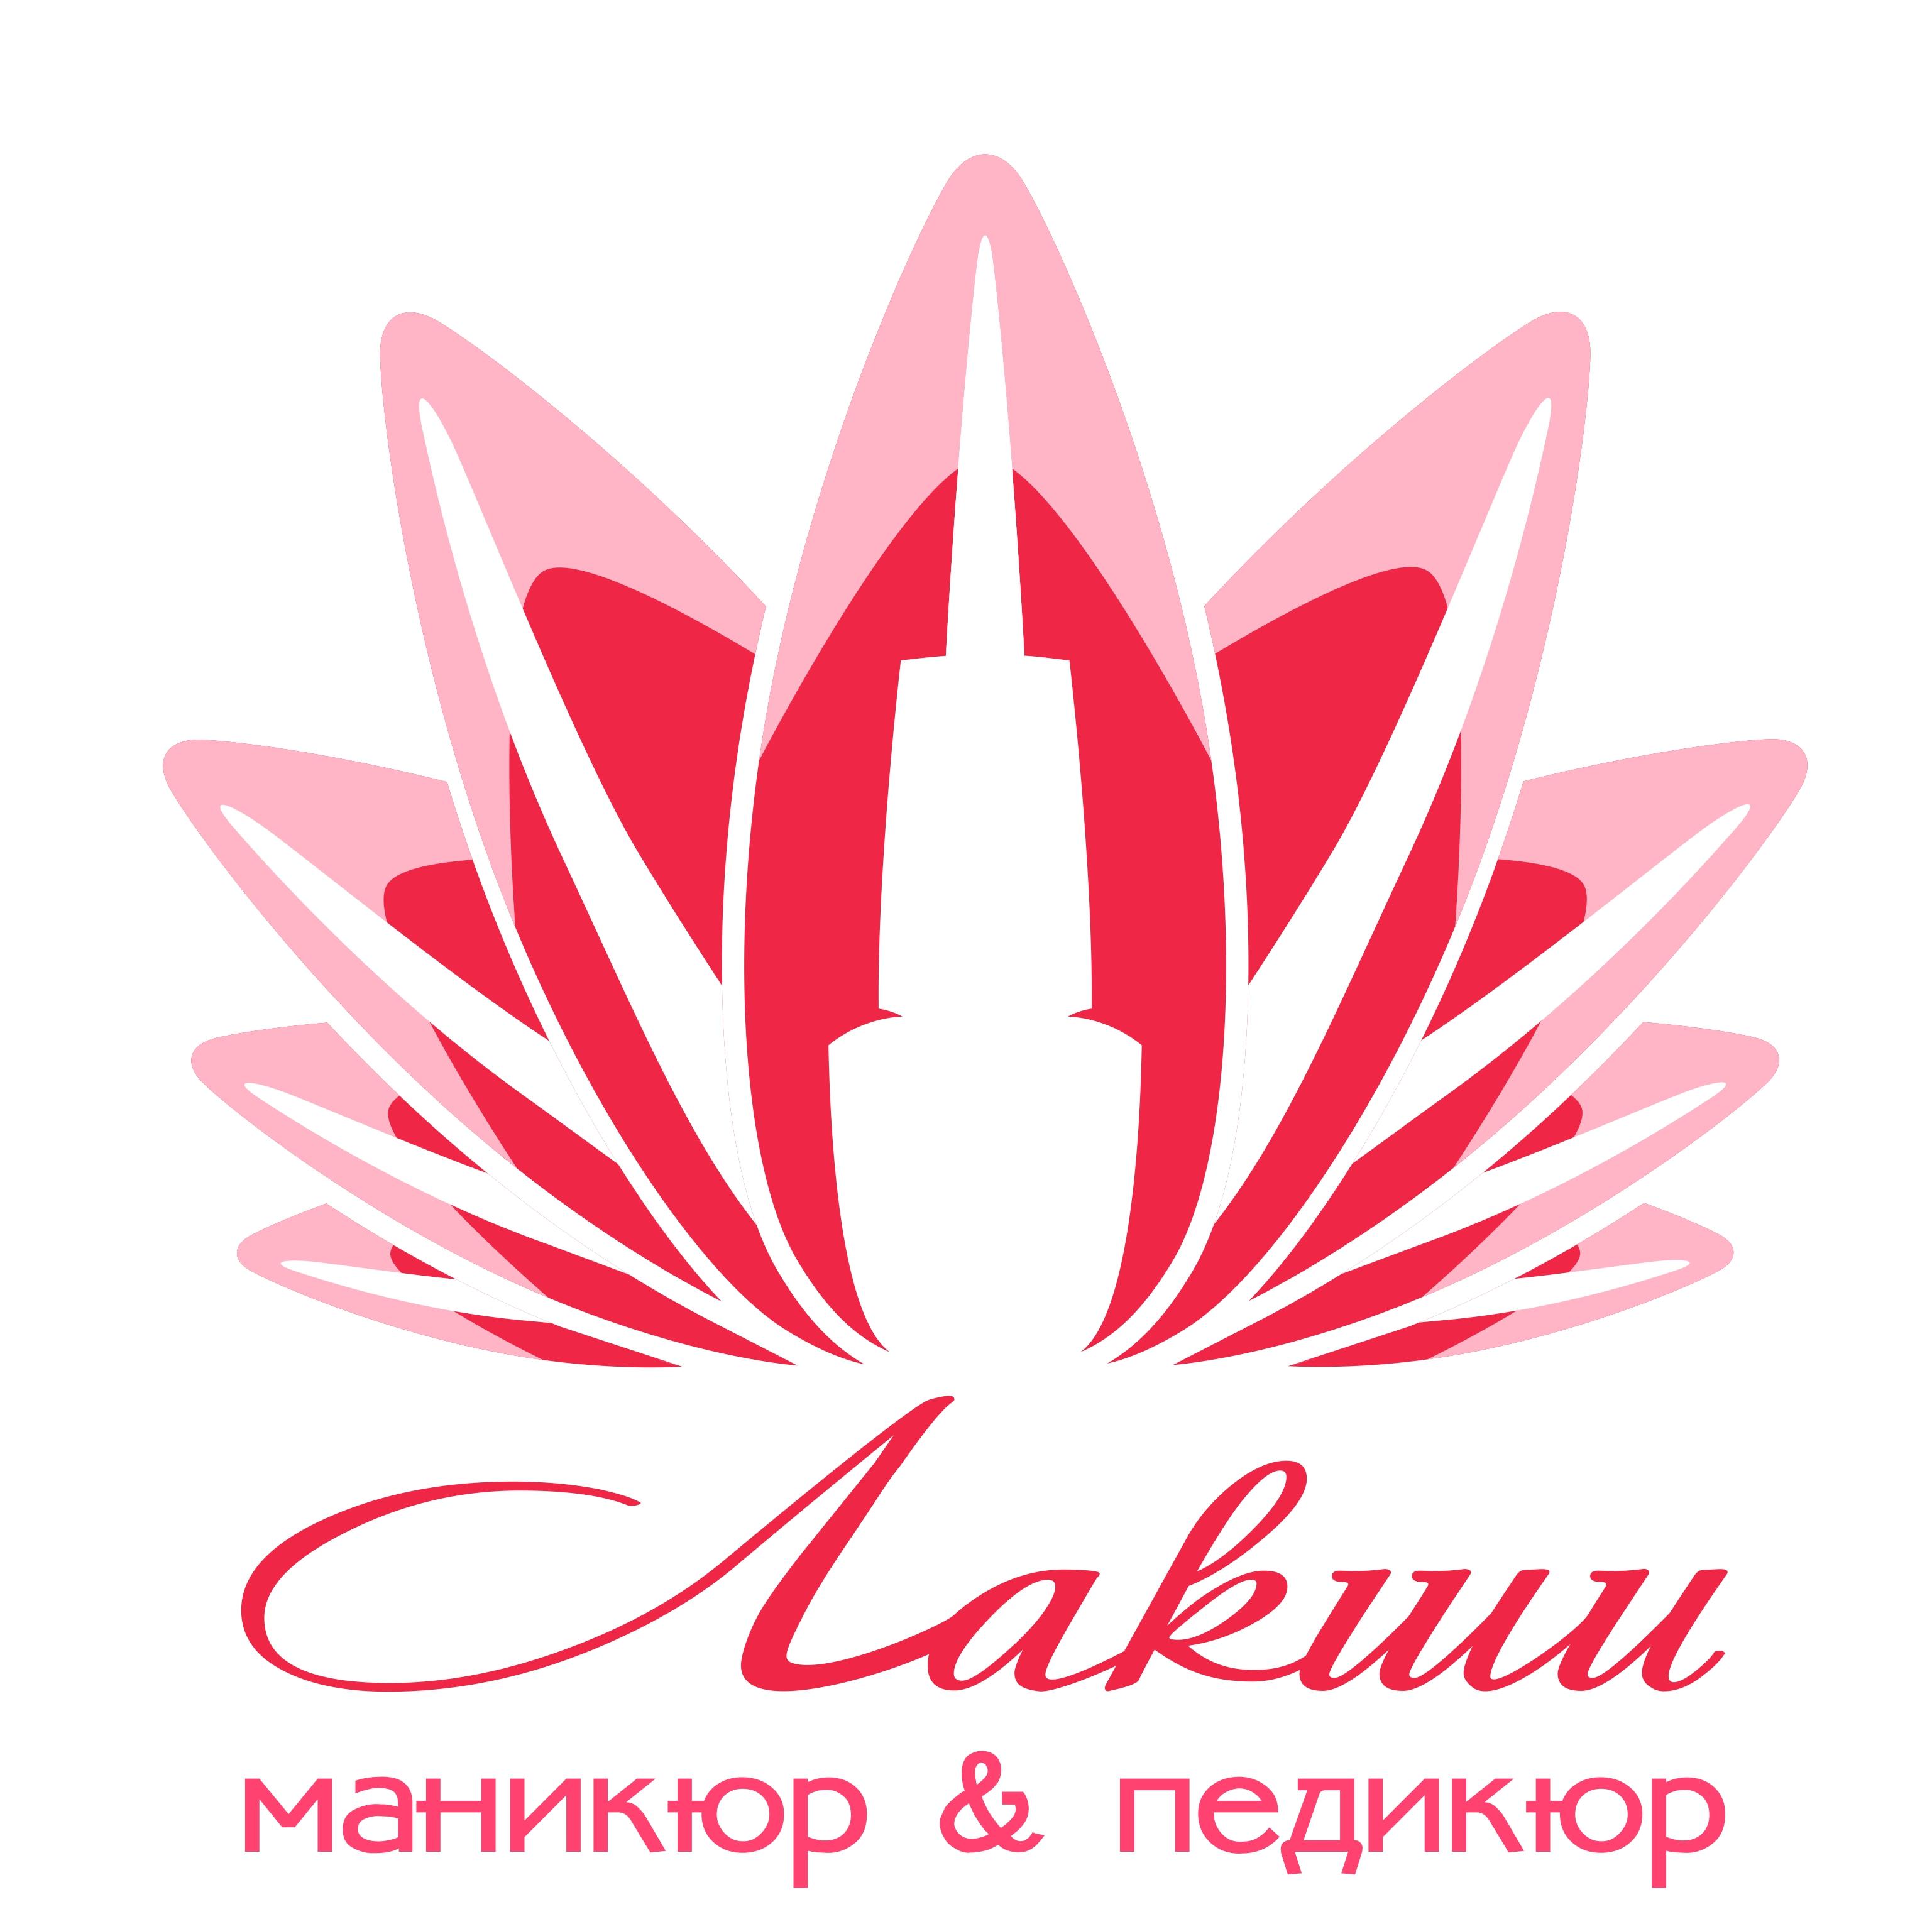 Разработка логотипа фирменного стиля фото f_0265c5971bb20123.jpg